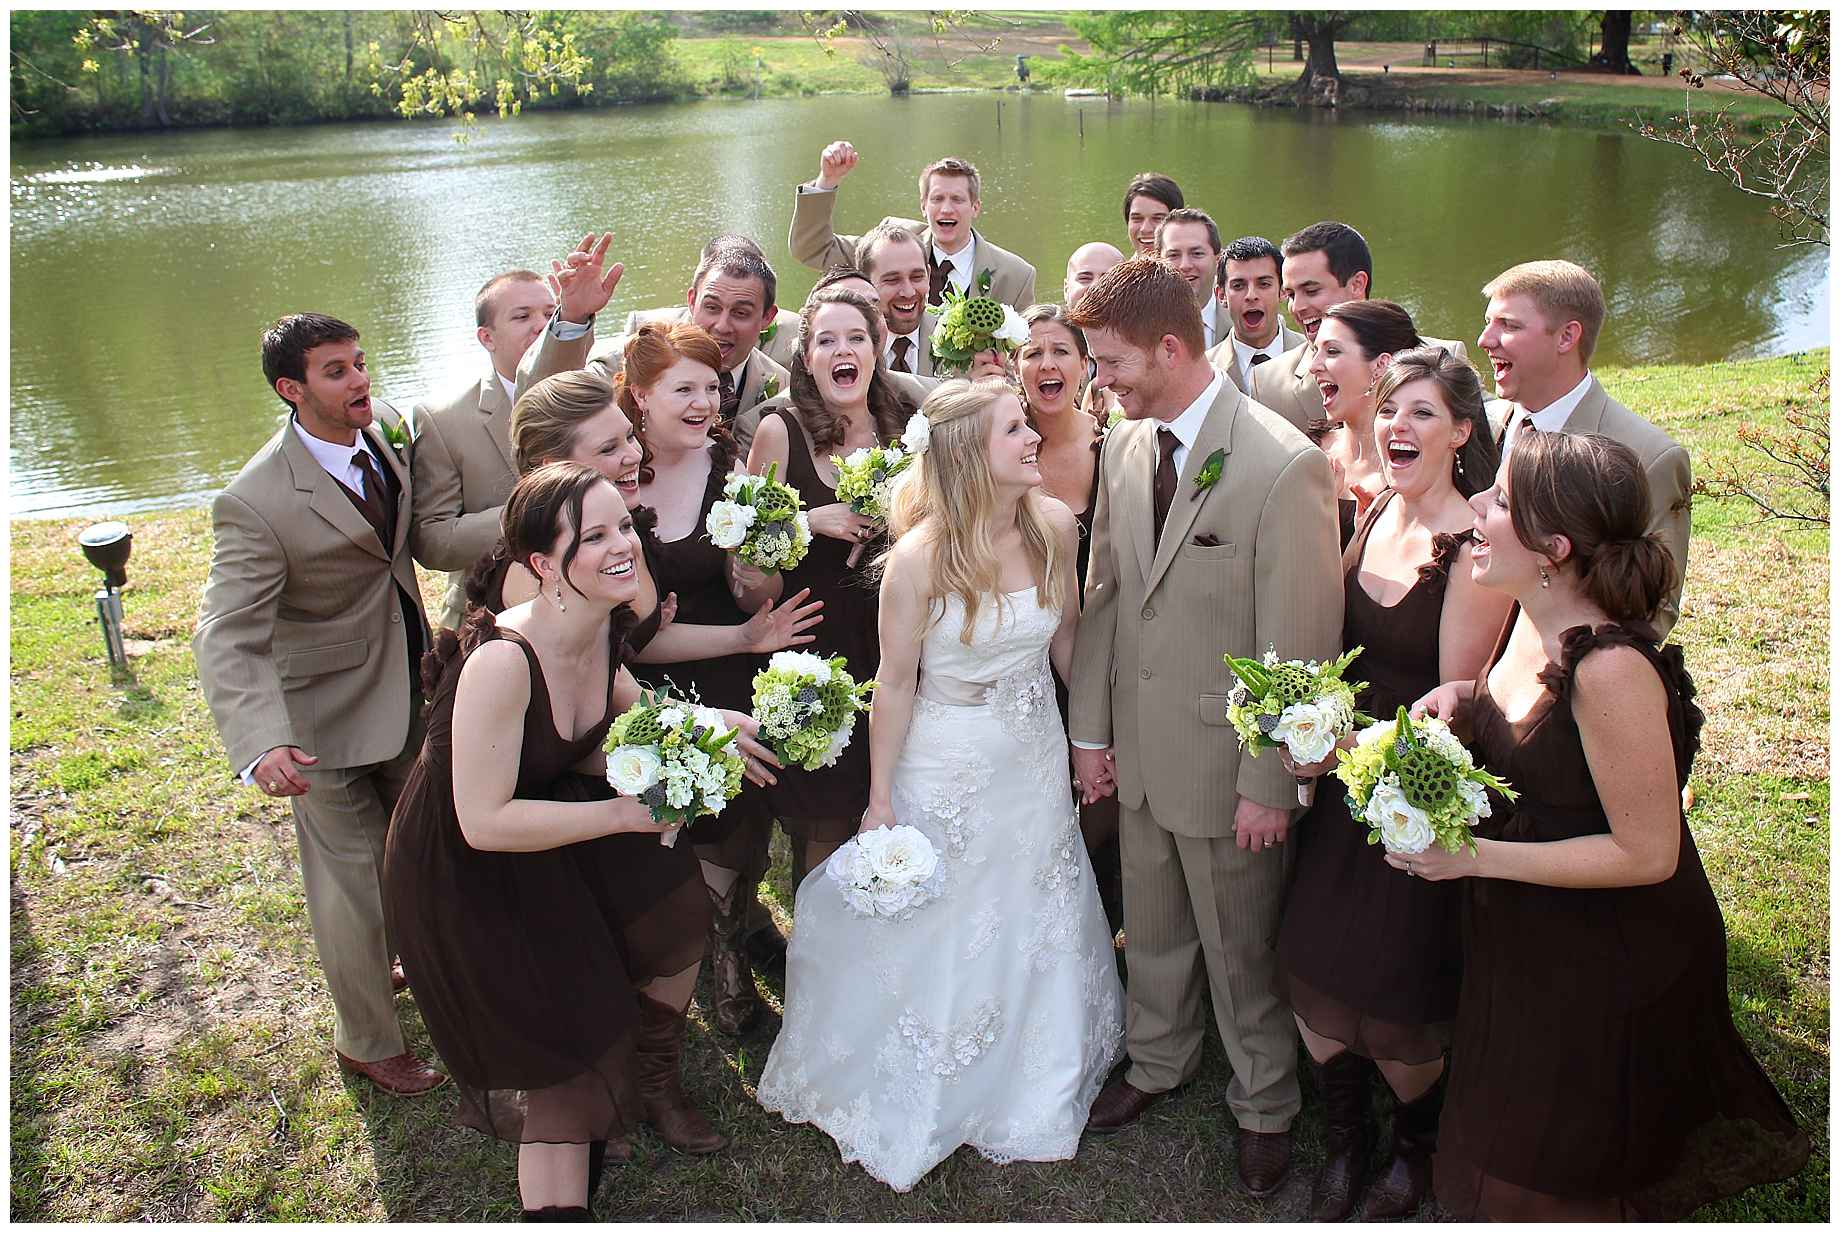 aggie-wedding-photos-_0019